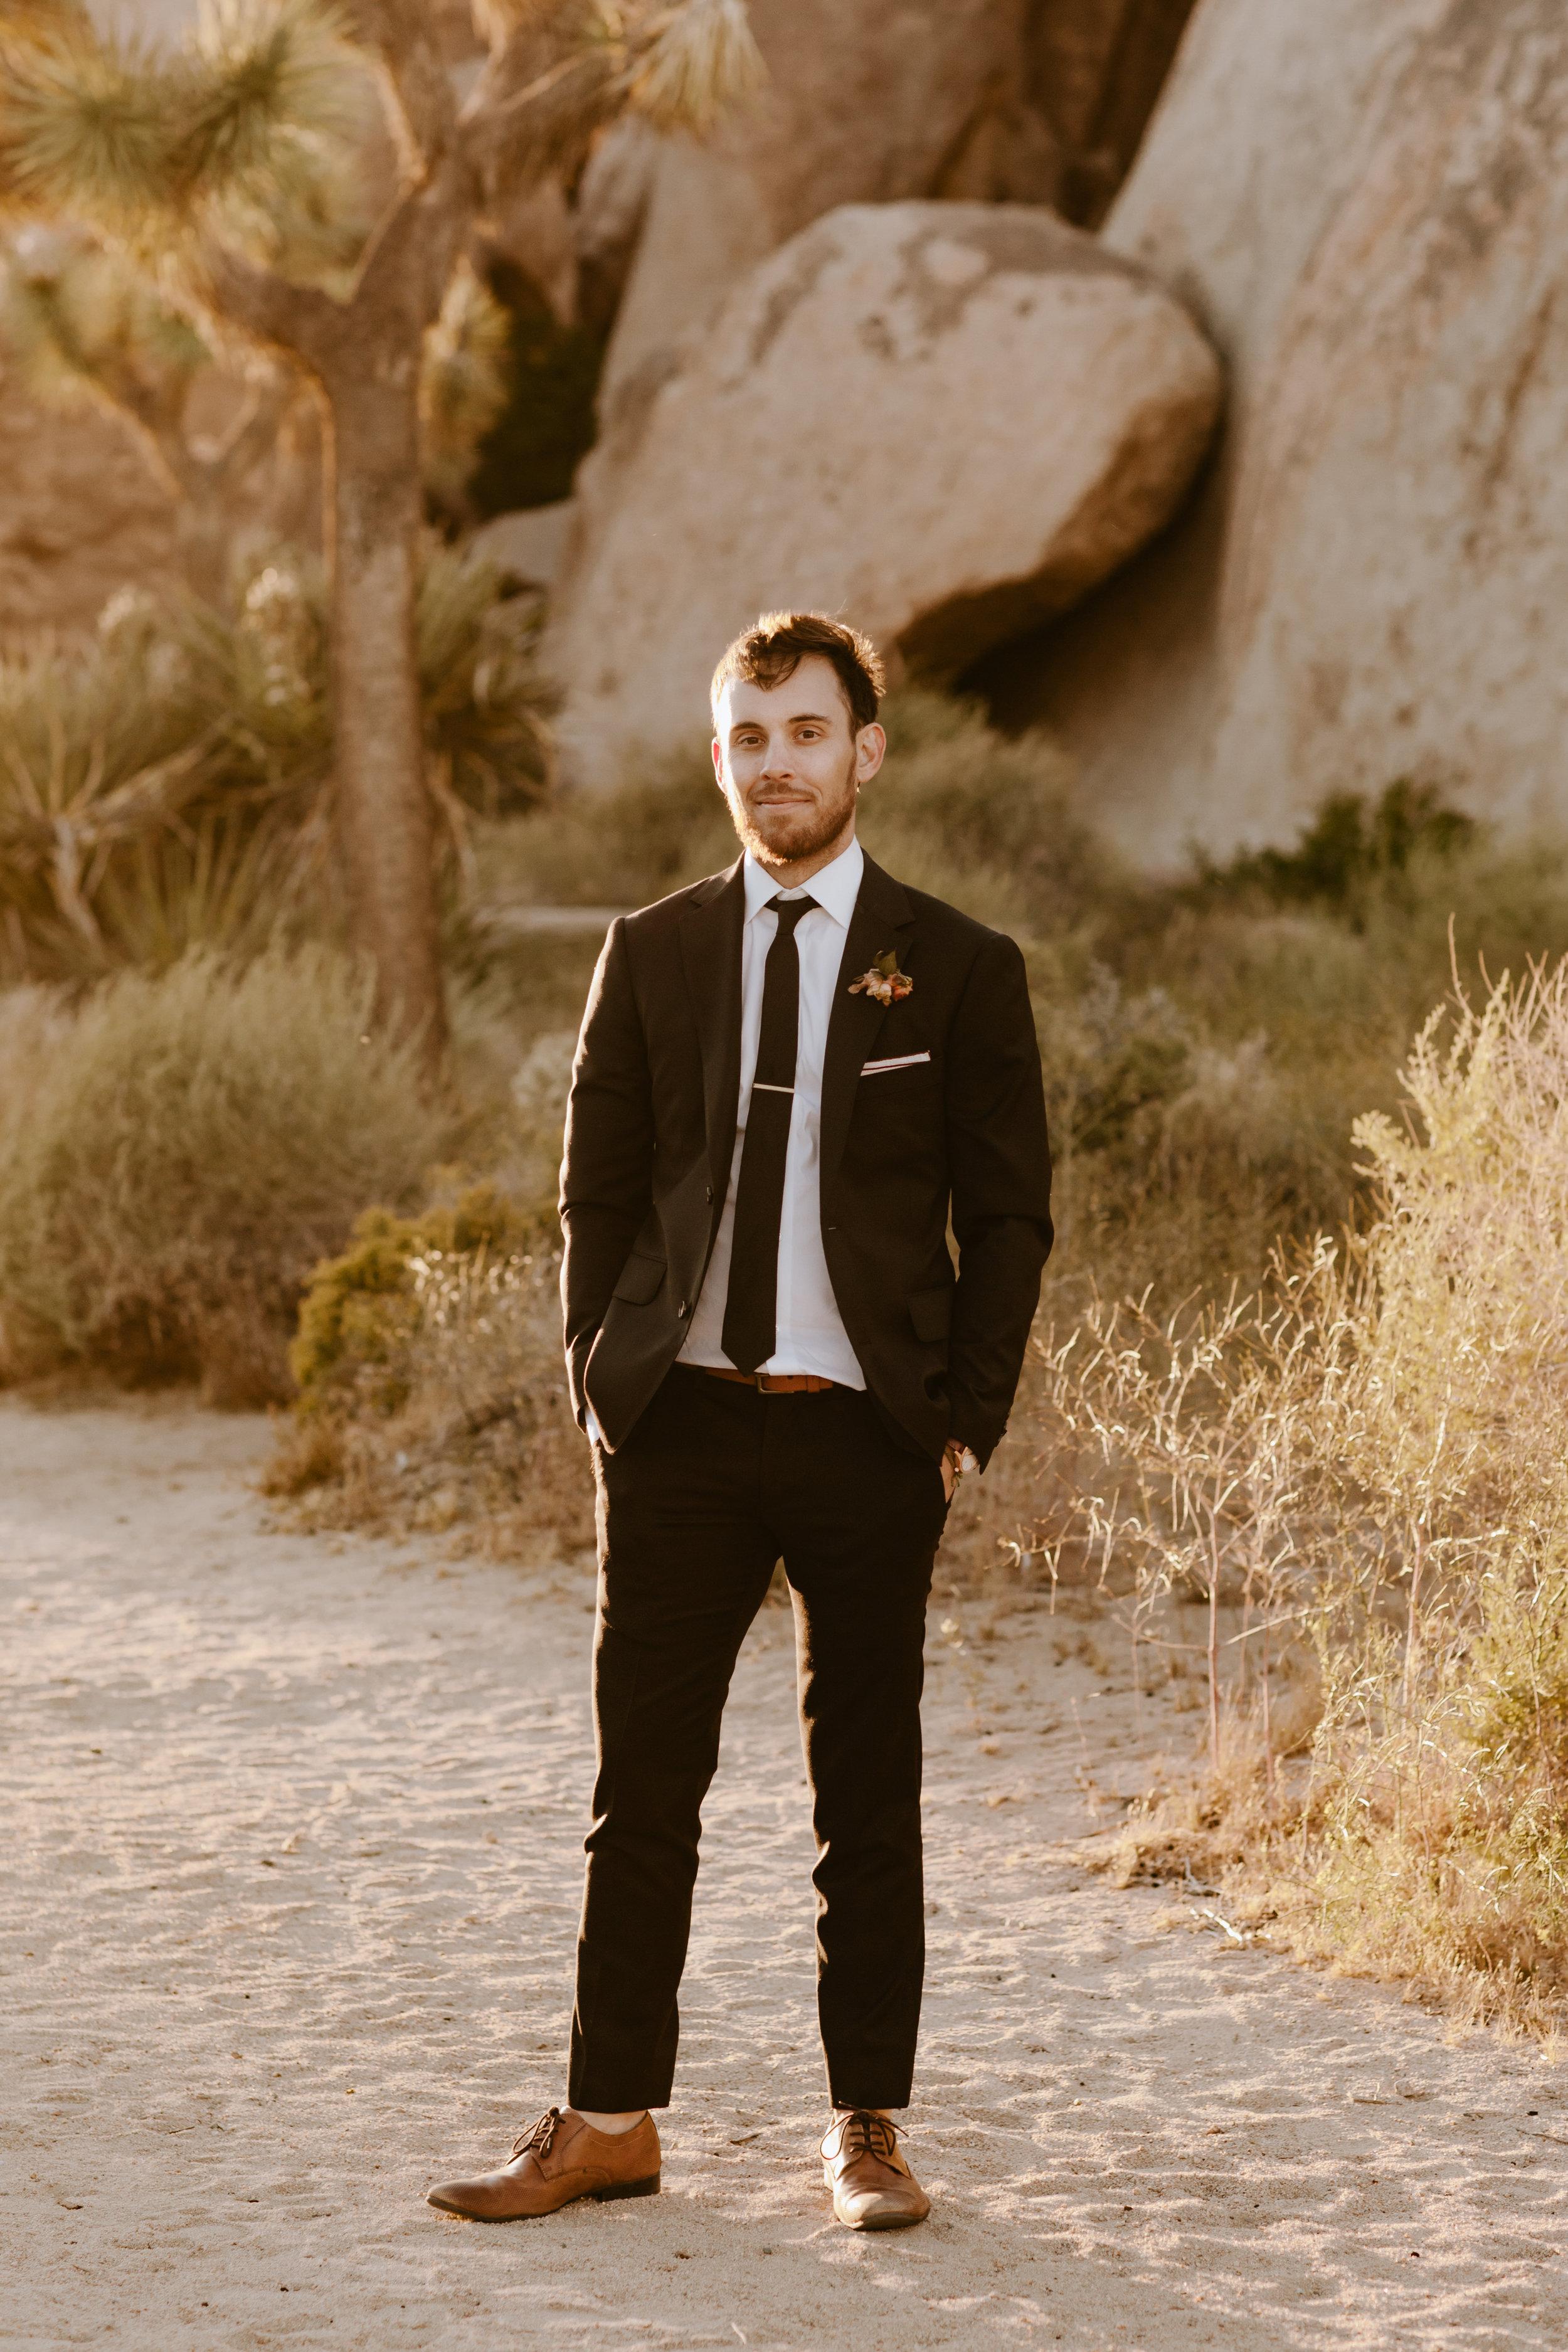 2019-05-26_Callie-Evan_Wedding_Joshua Tree_Paige Nelson_PREVIEWS HR-62.jpg